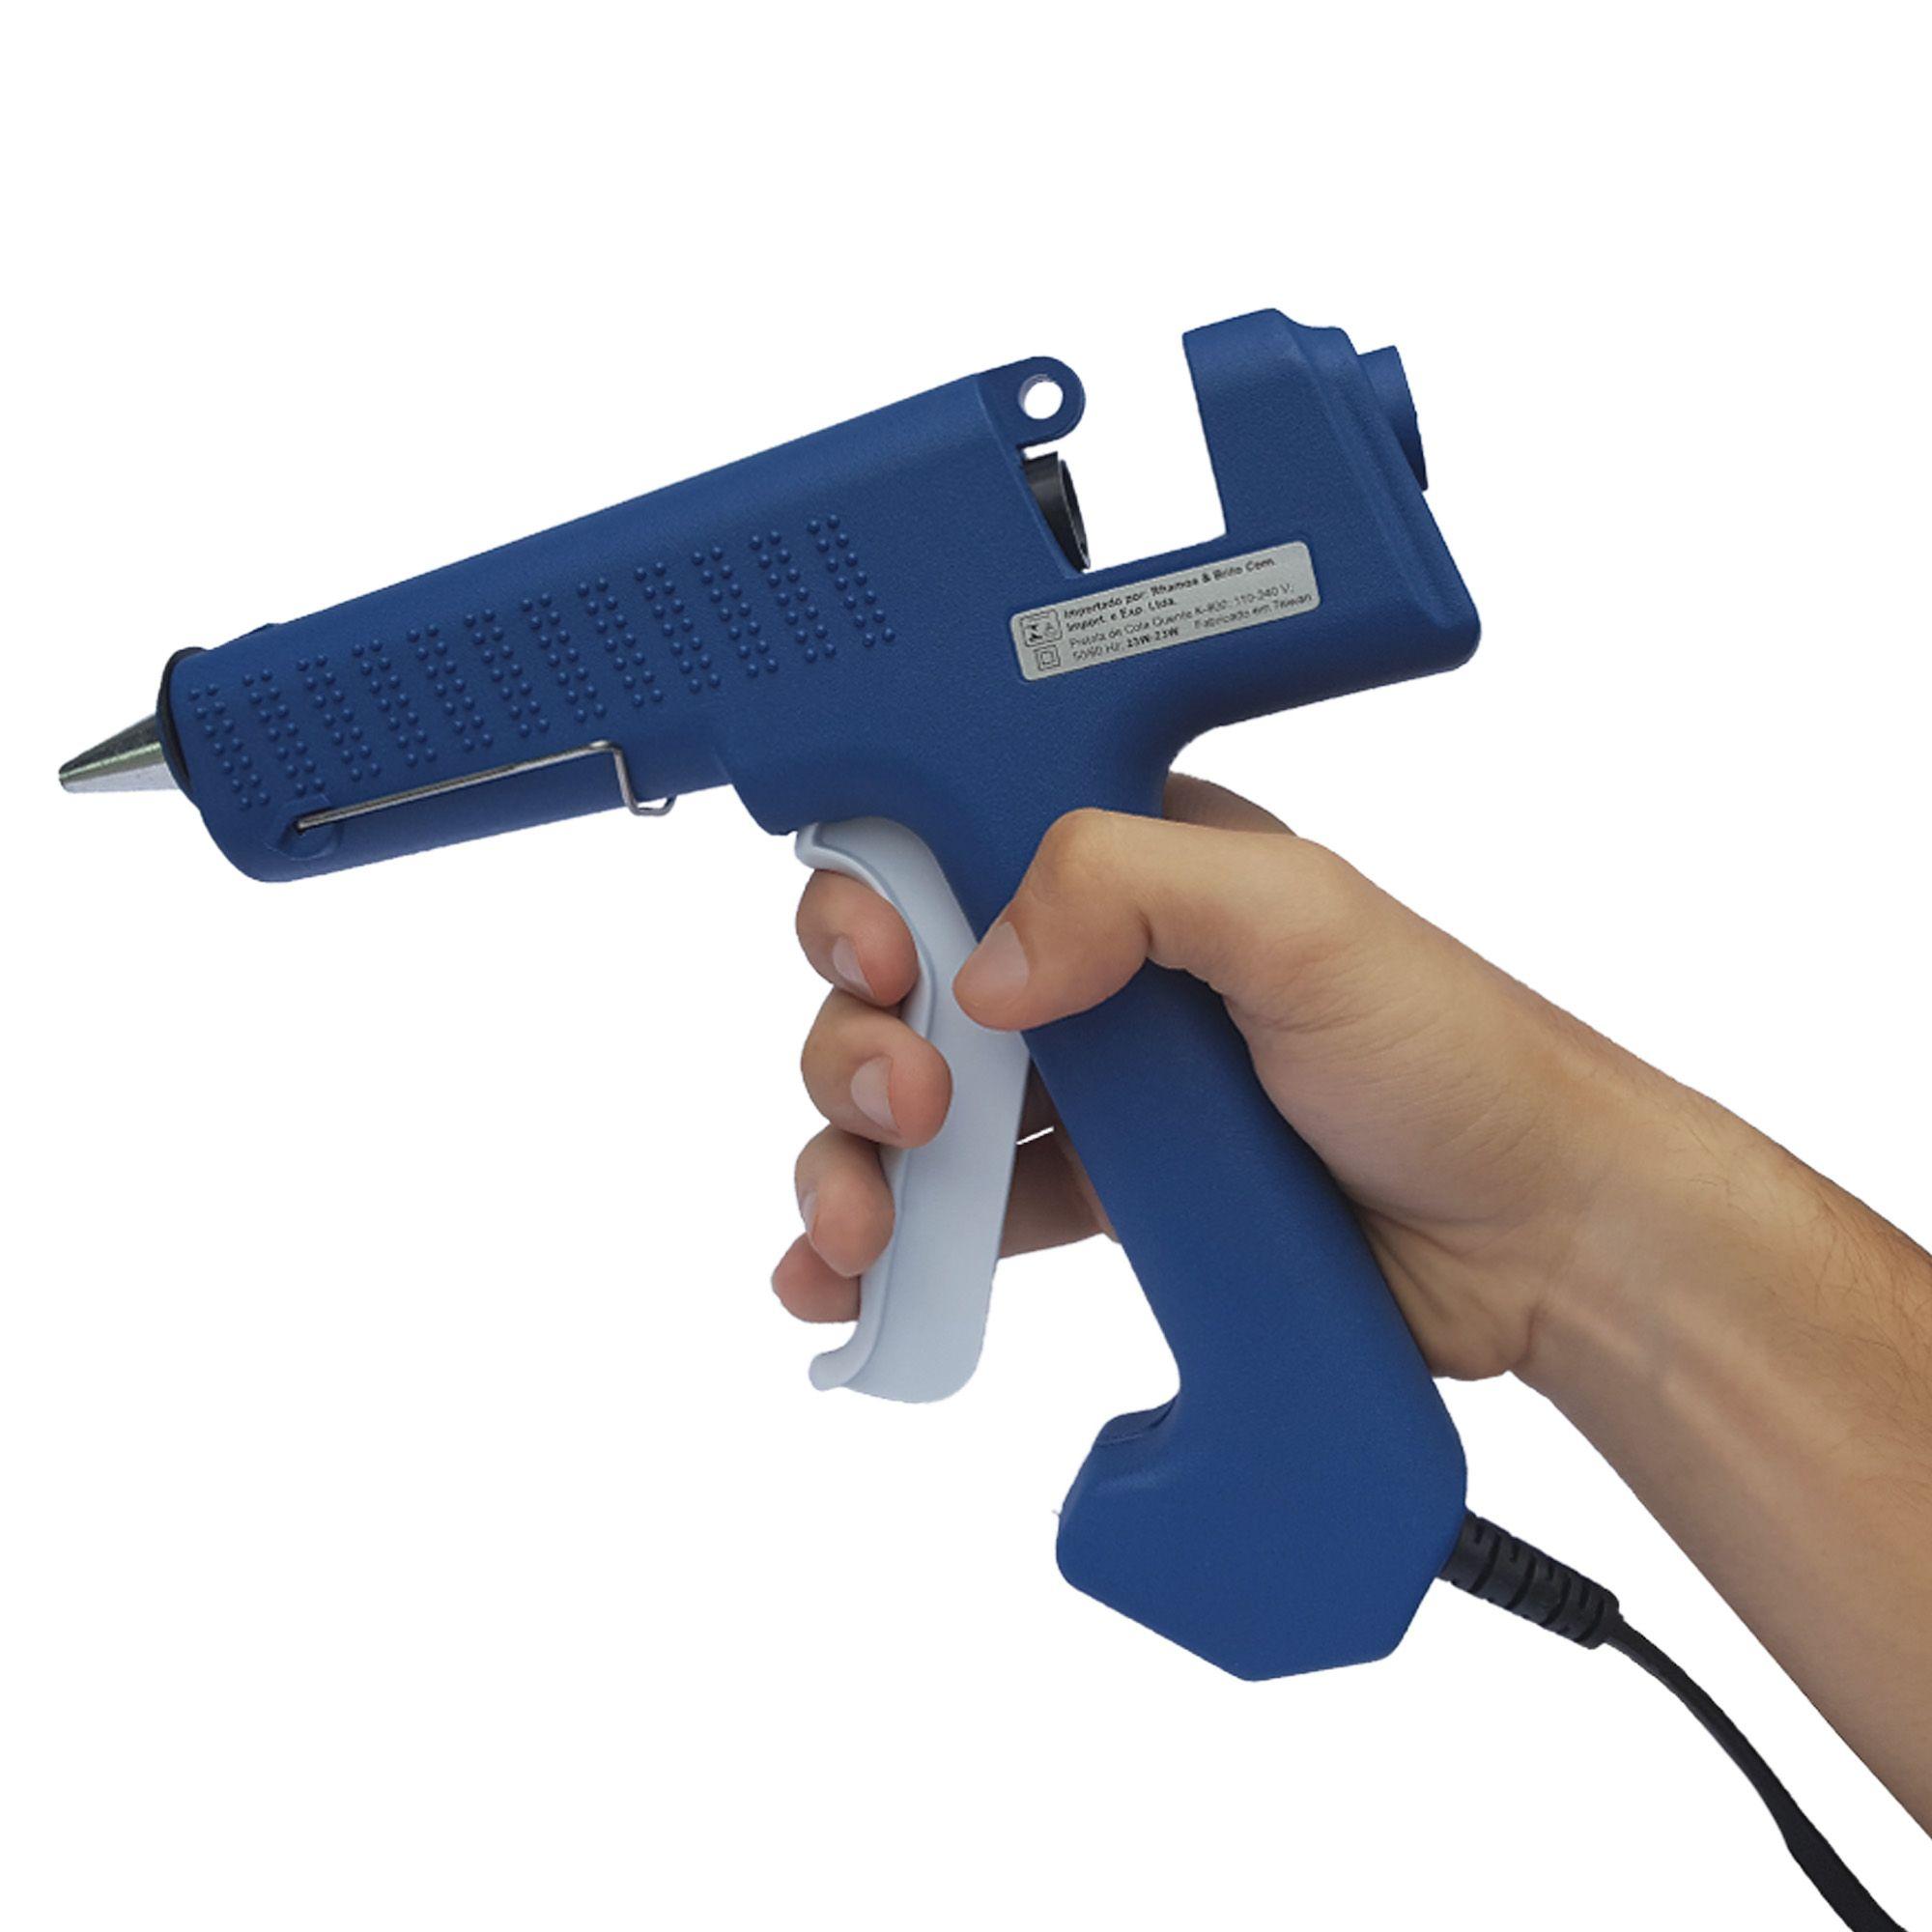 Pistola Aplicadora para cola quente profissional K-800